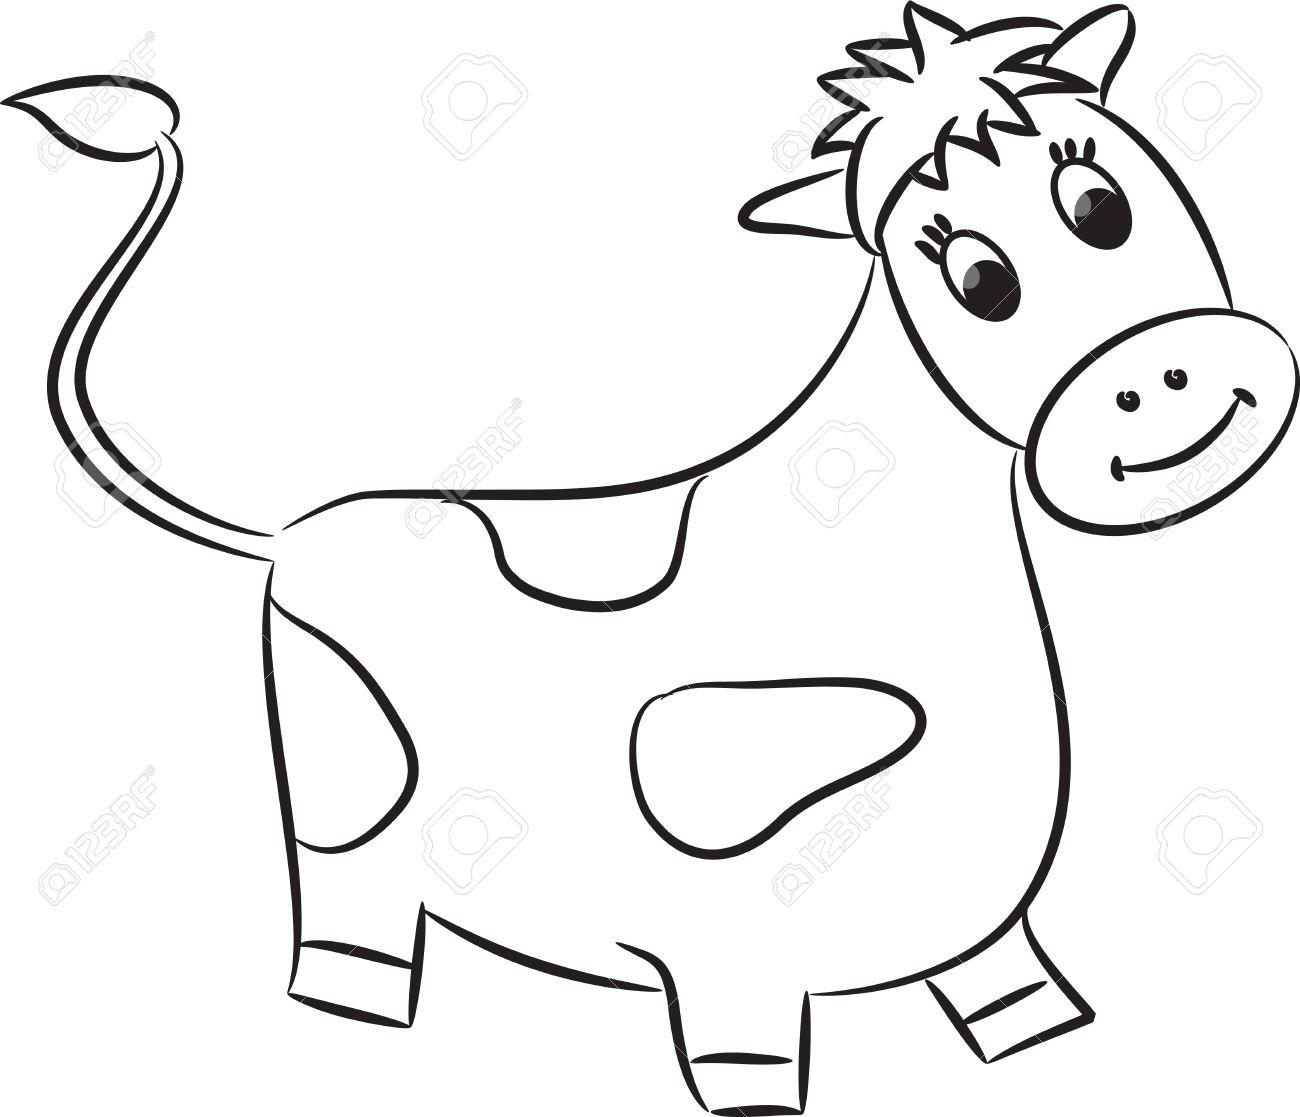 1300x1117 Cartoon Cow Drawing